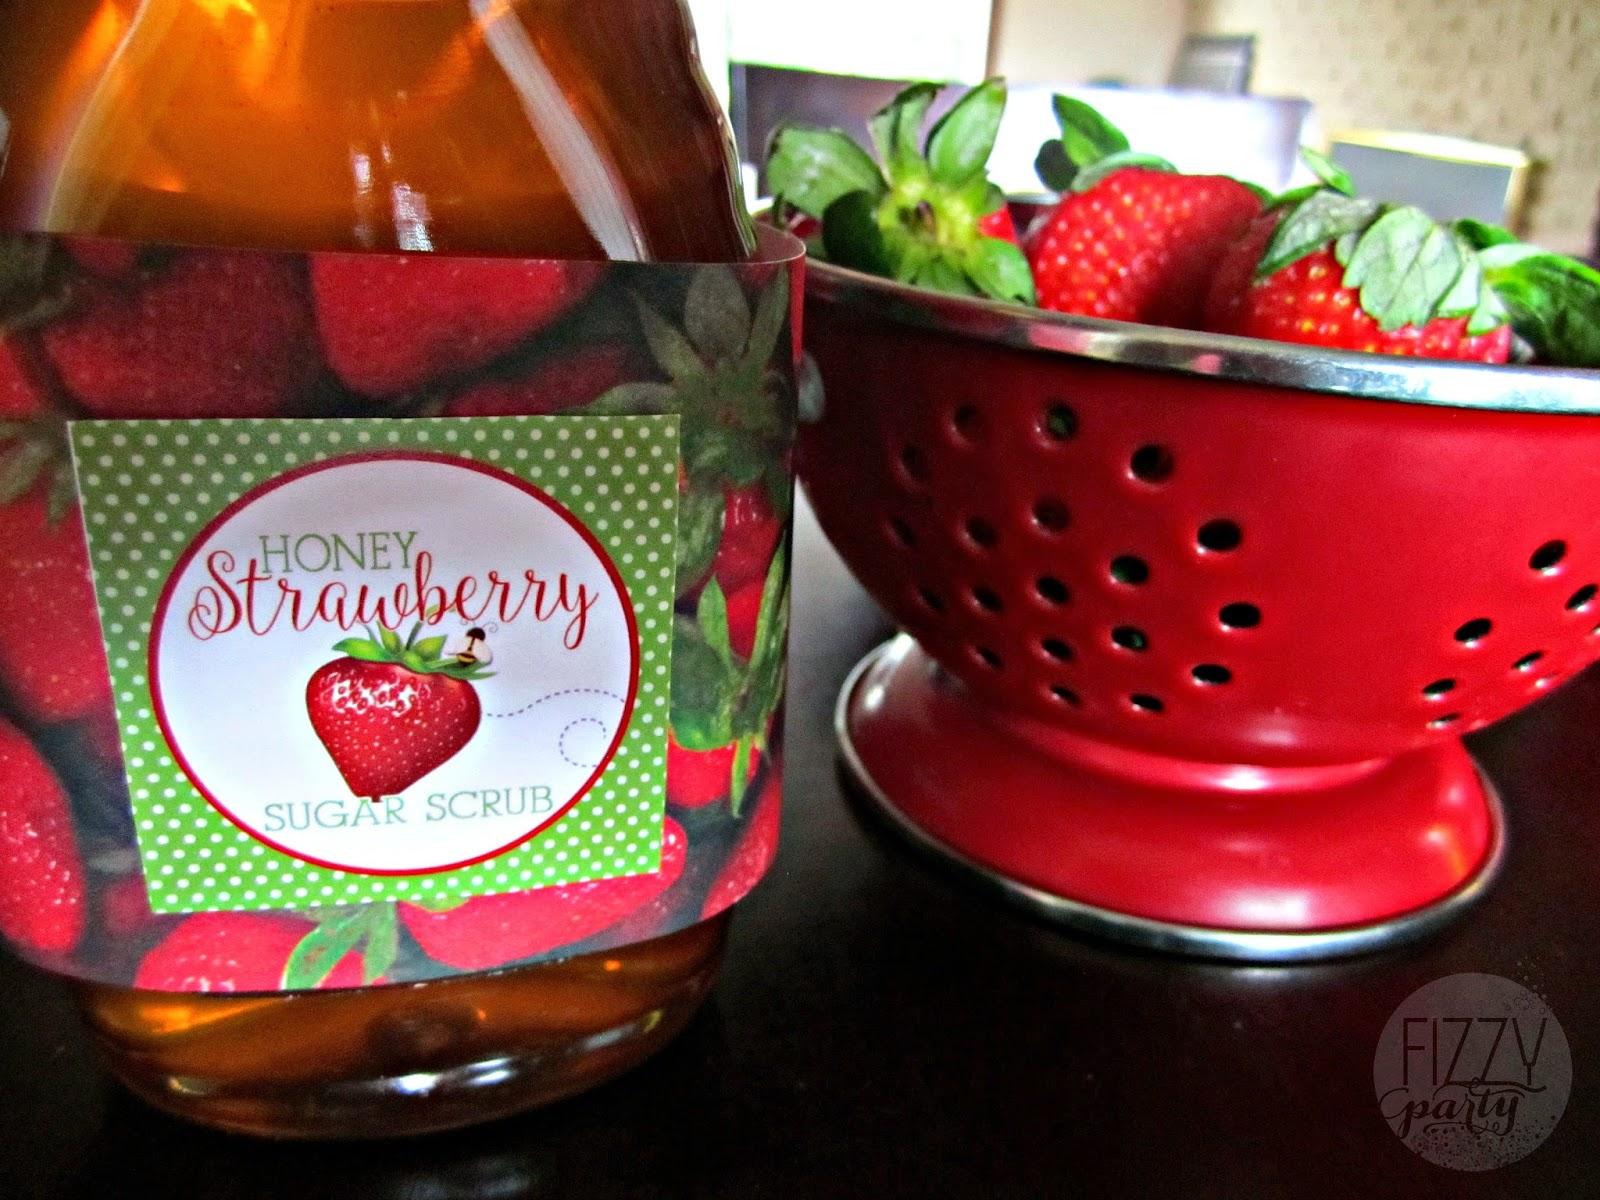 Honey strawberry sugar scrub ingredients